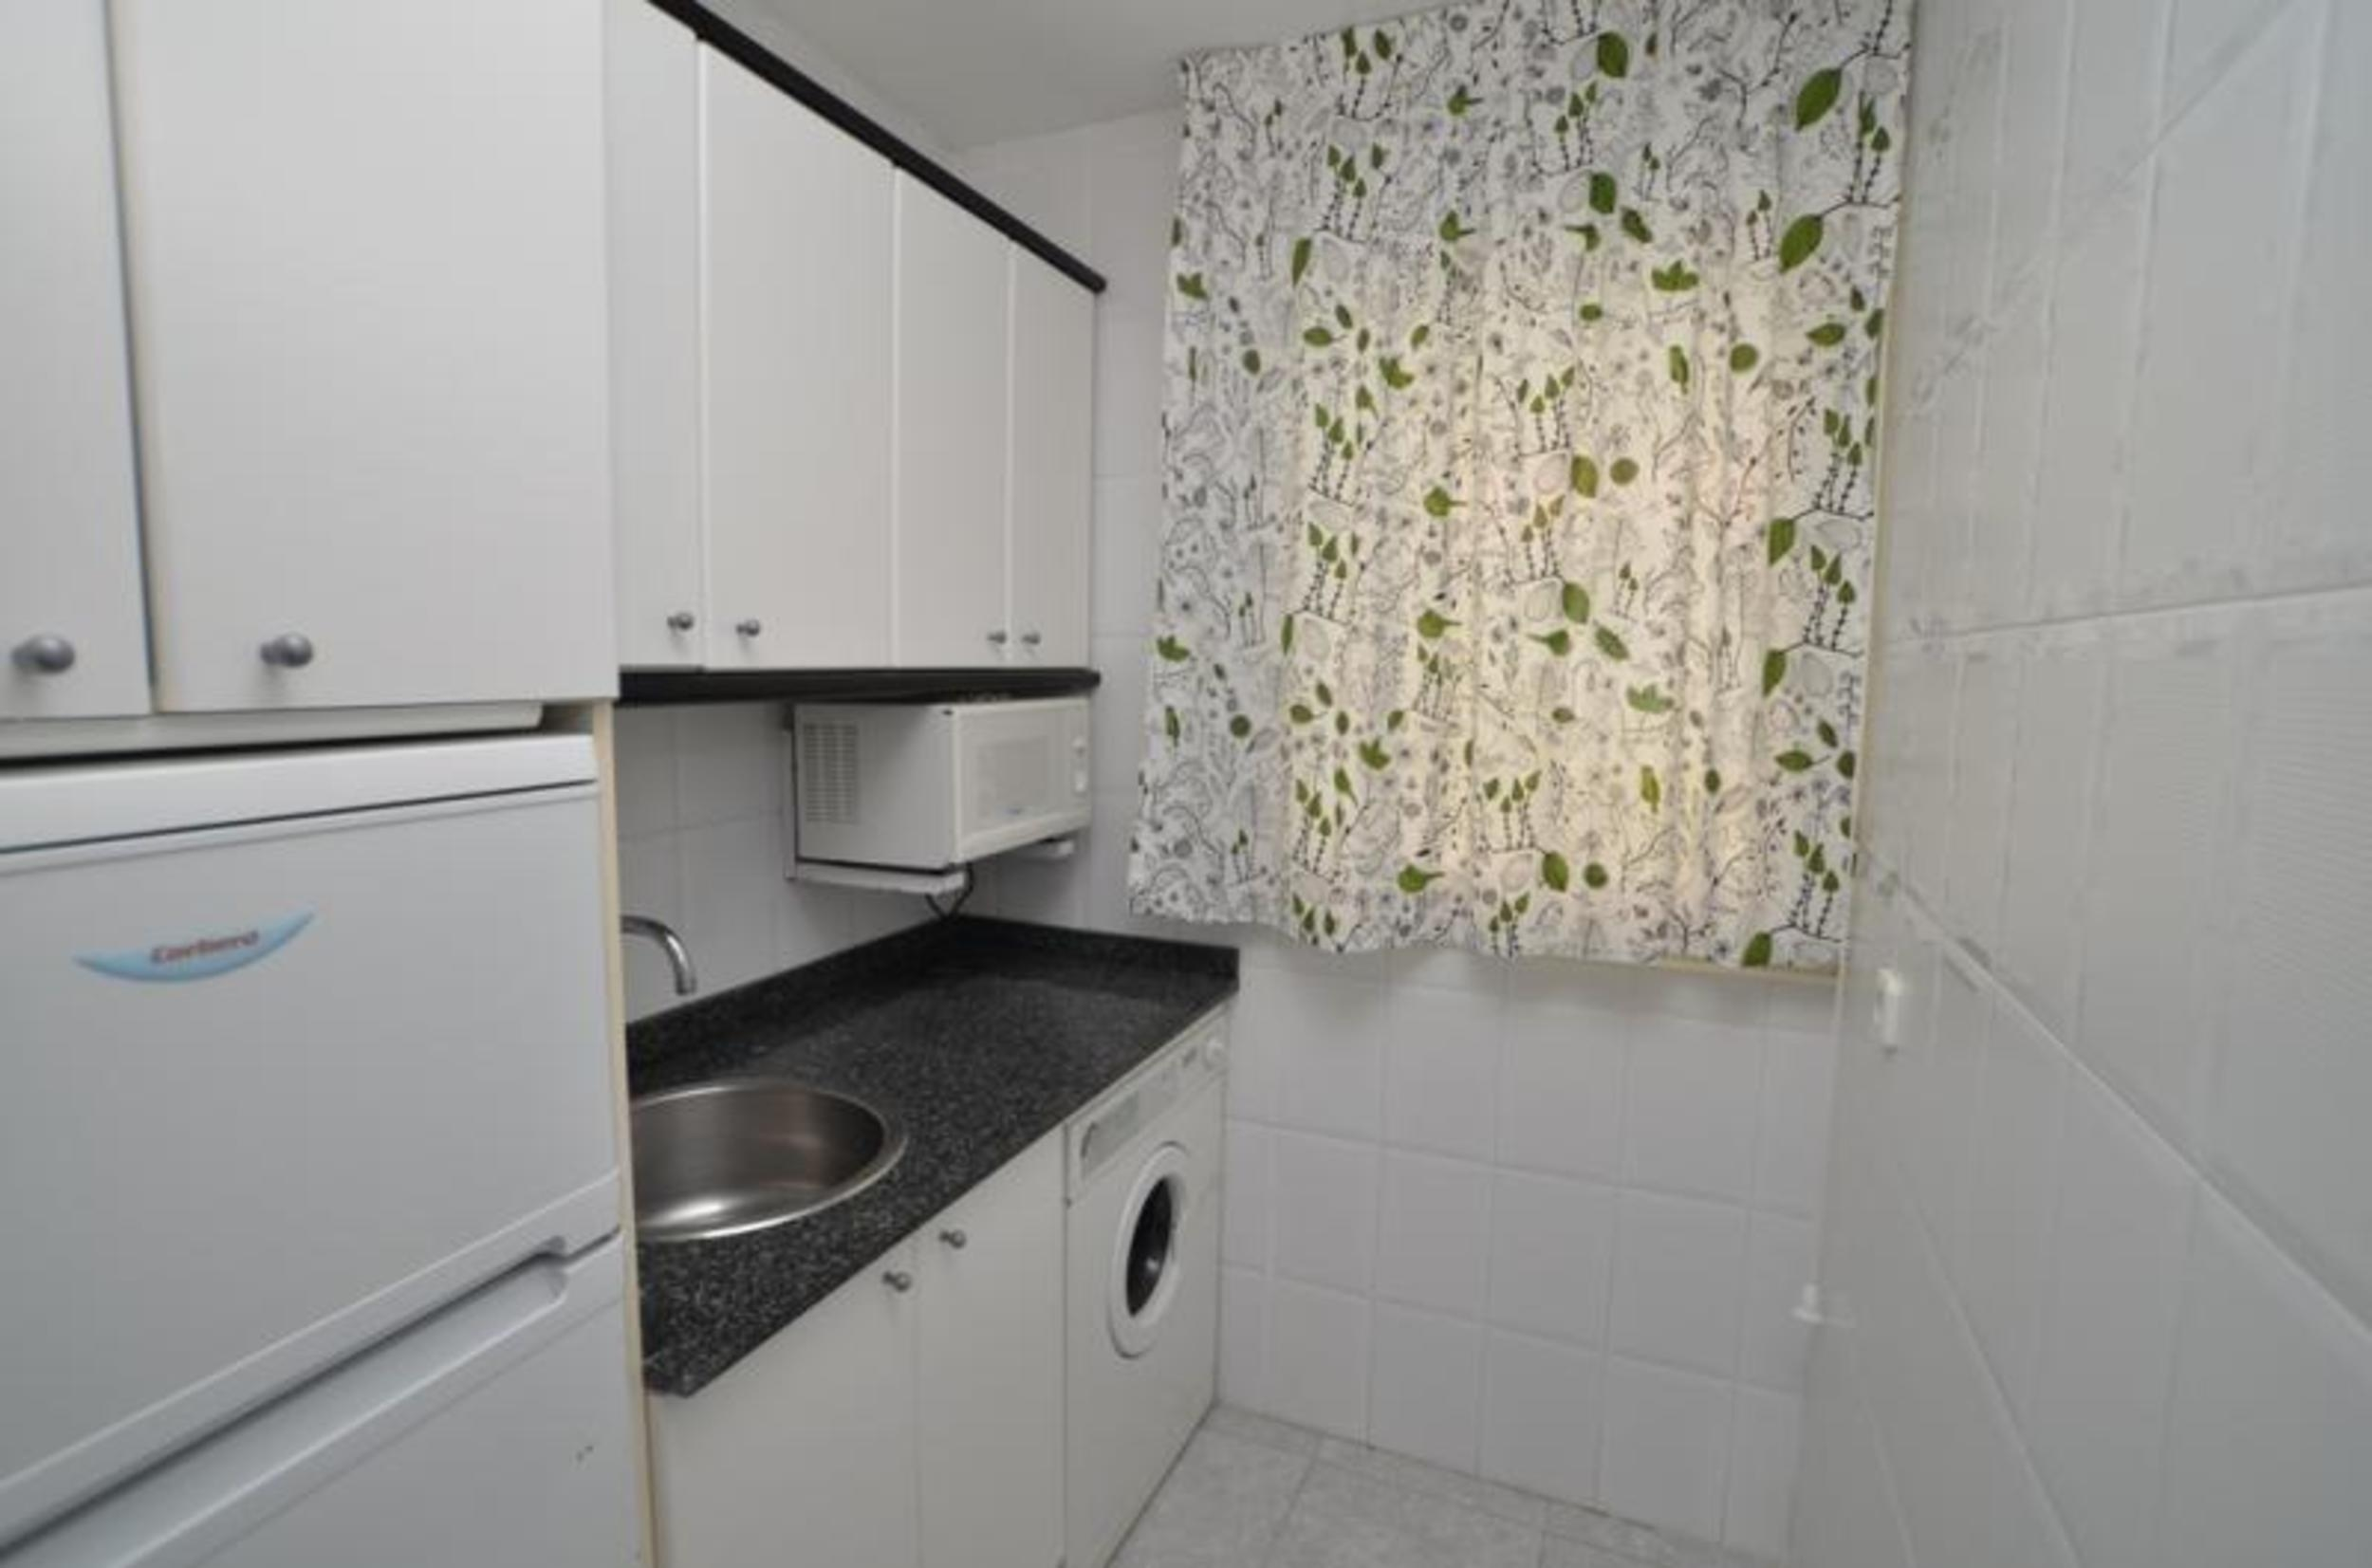 Ferienwohnung Apartment - 2 Bedrooms with Pool and Sea views - 102761 (2360861), Isla, Costa de Cantabria, Kantabrien, Spanien, Bild 6